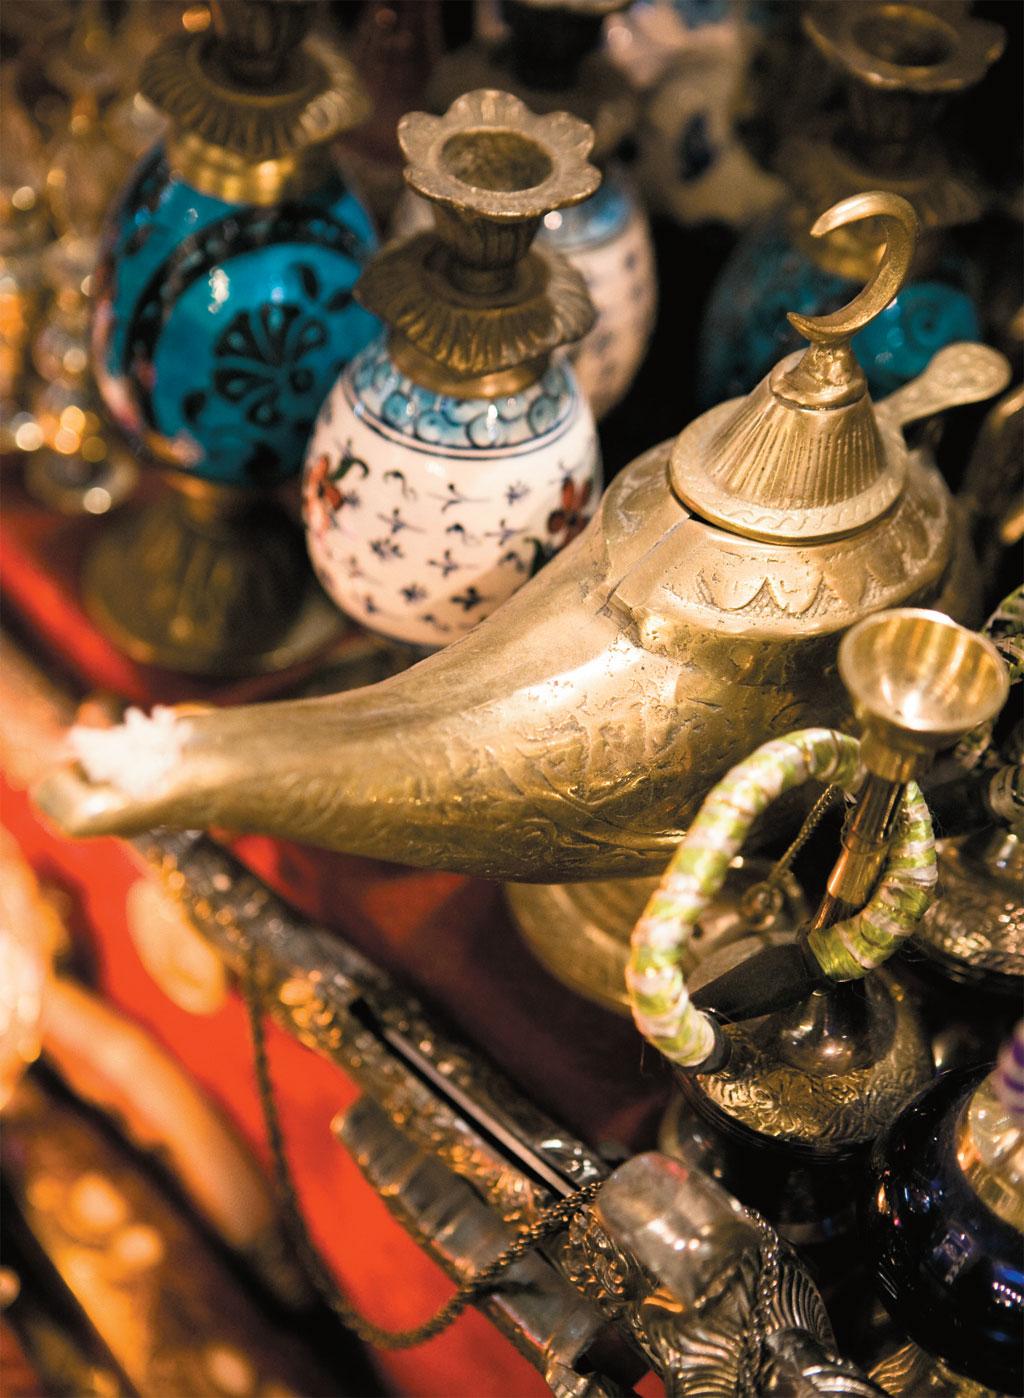 Bules e narguilés à venda no Grande Bazar, em Istambul, na Turquia